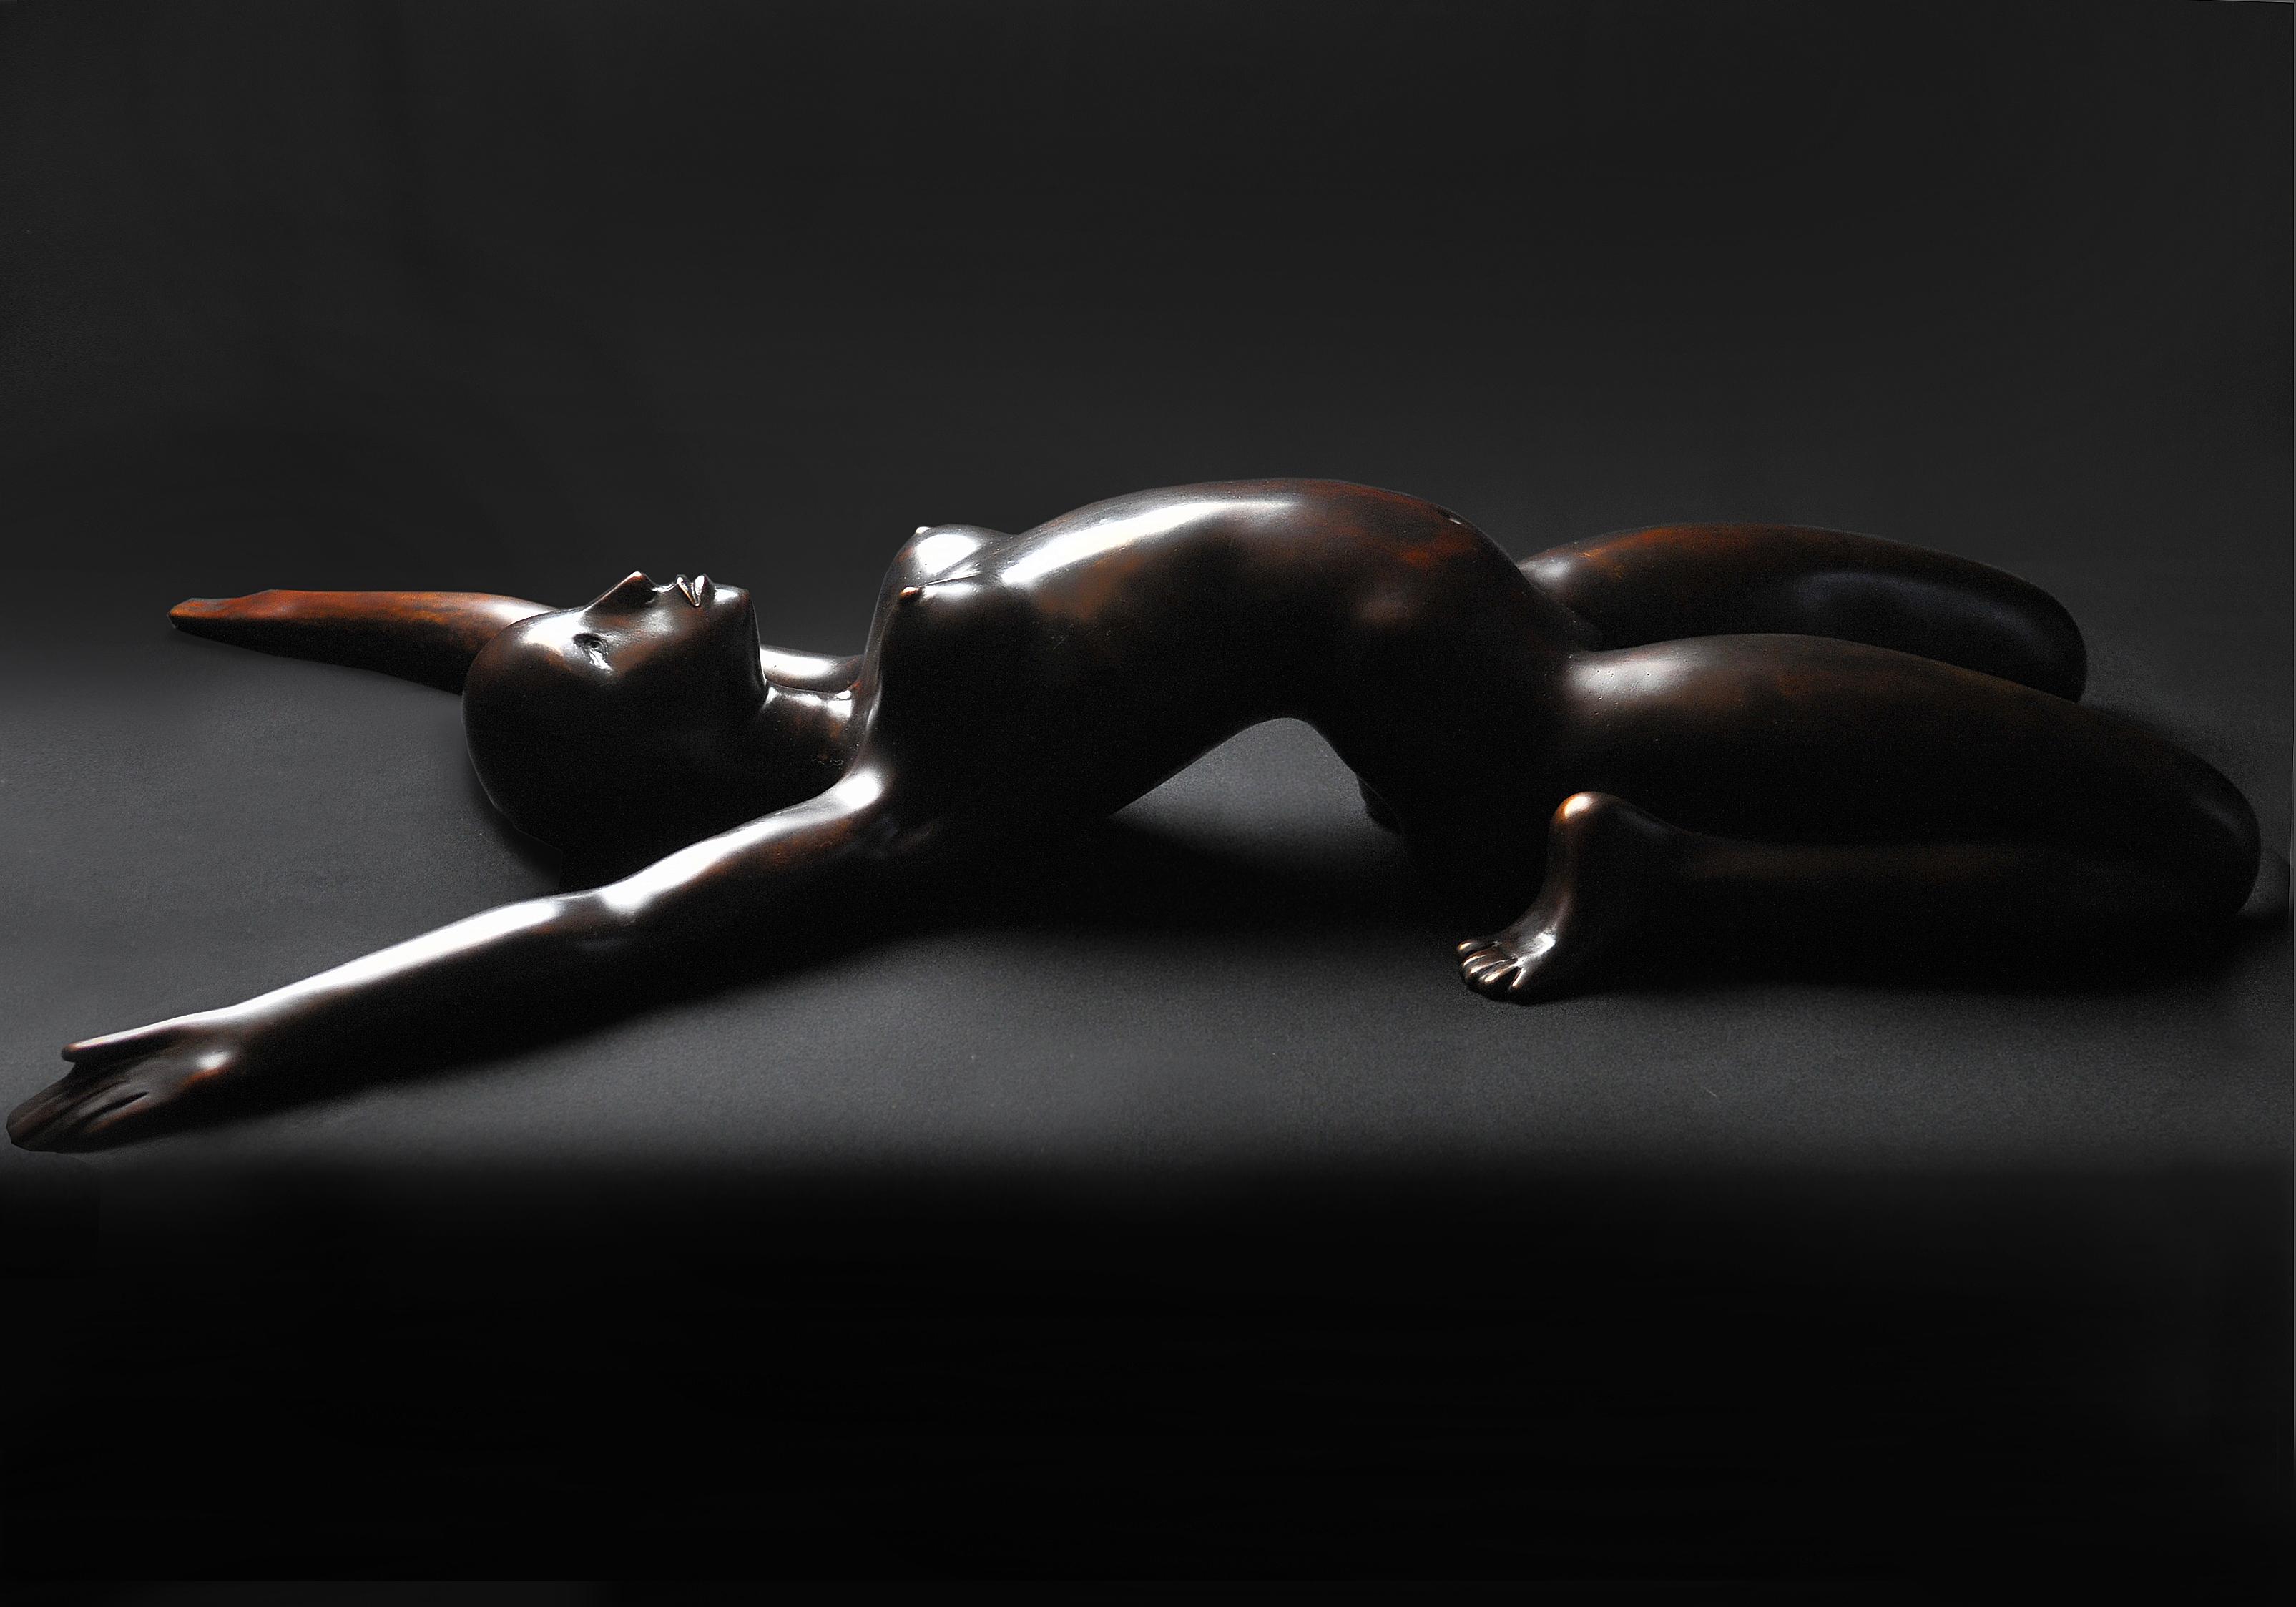 Серафим Чаркин, «Даная», бронза, 2012 год.